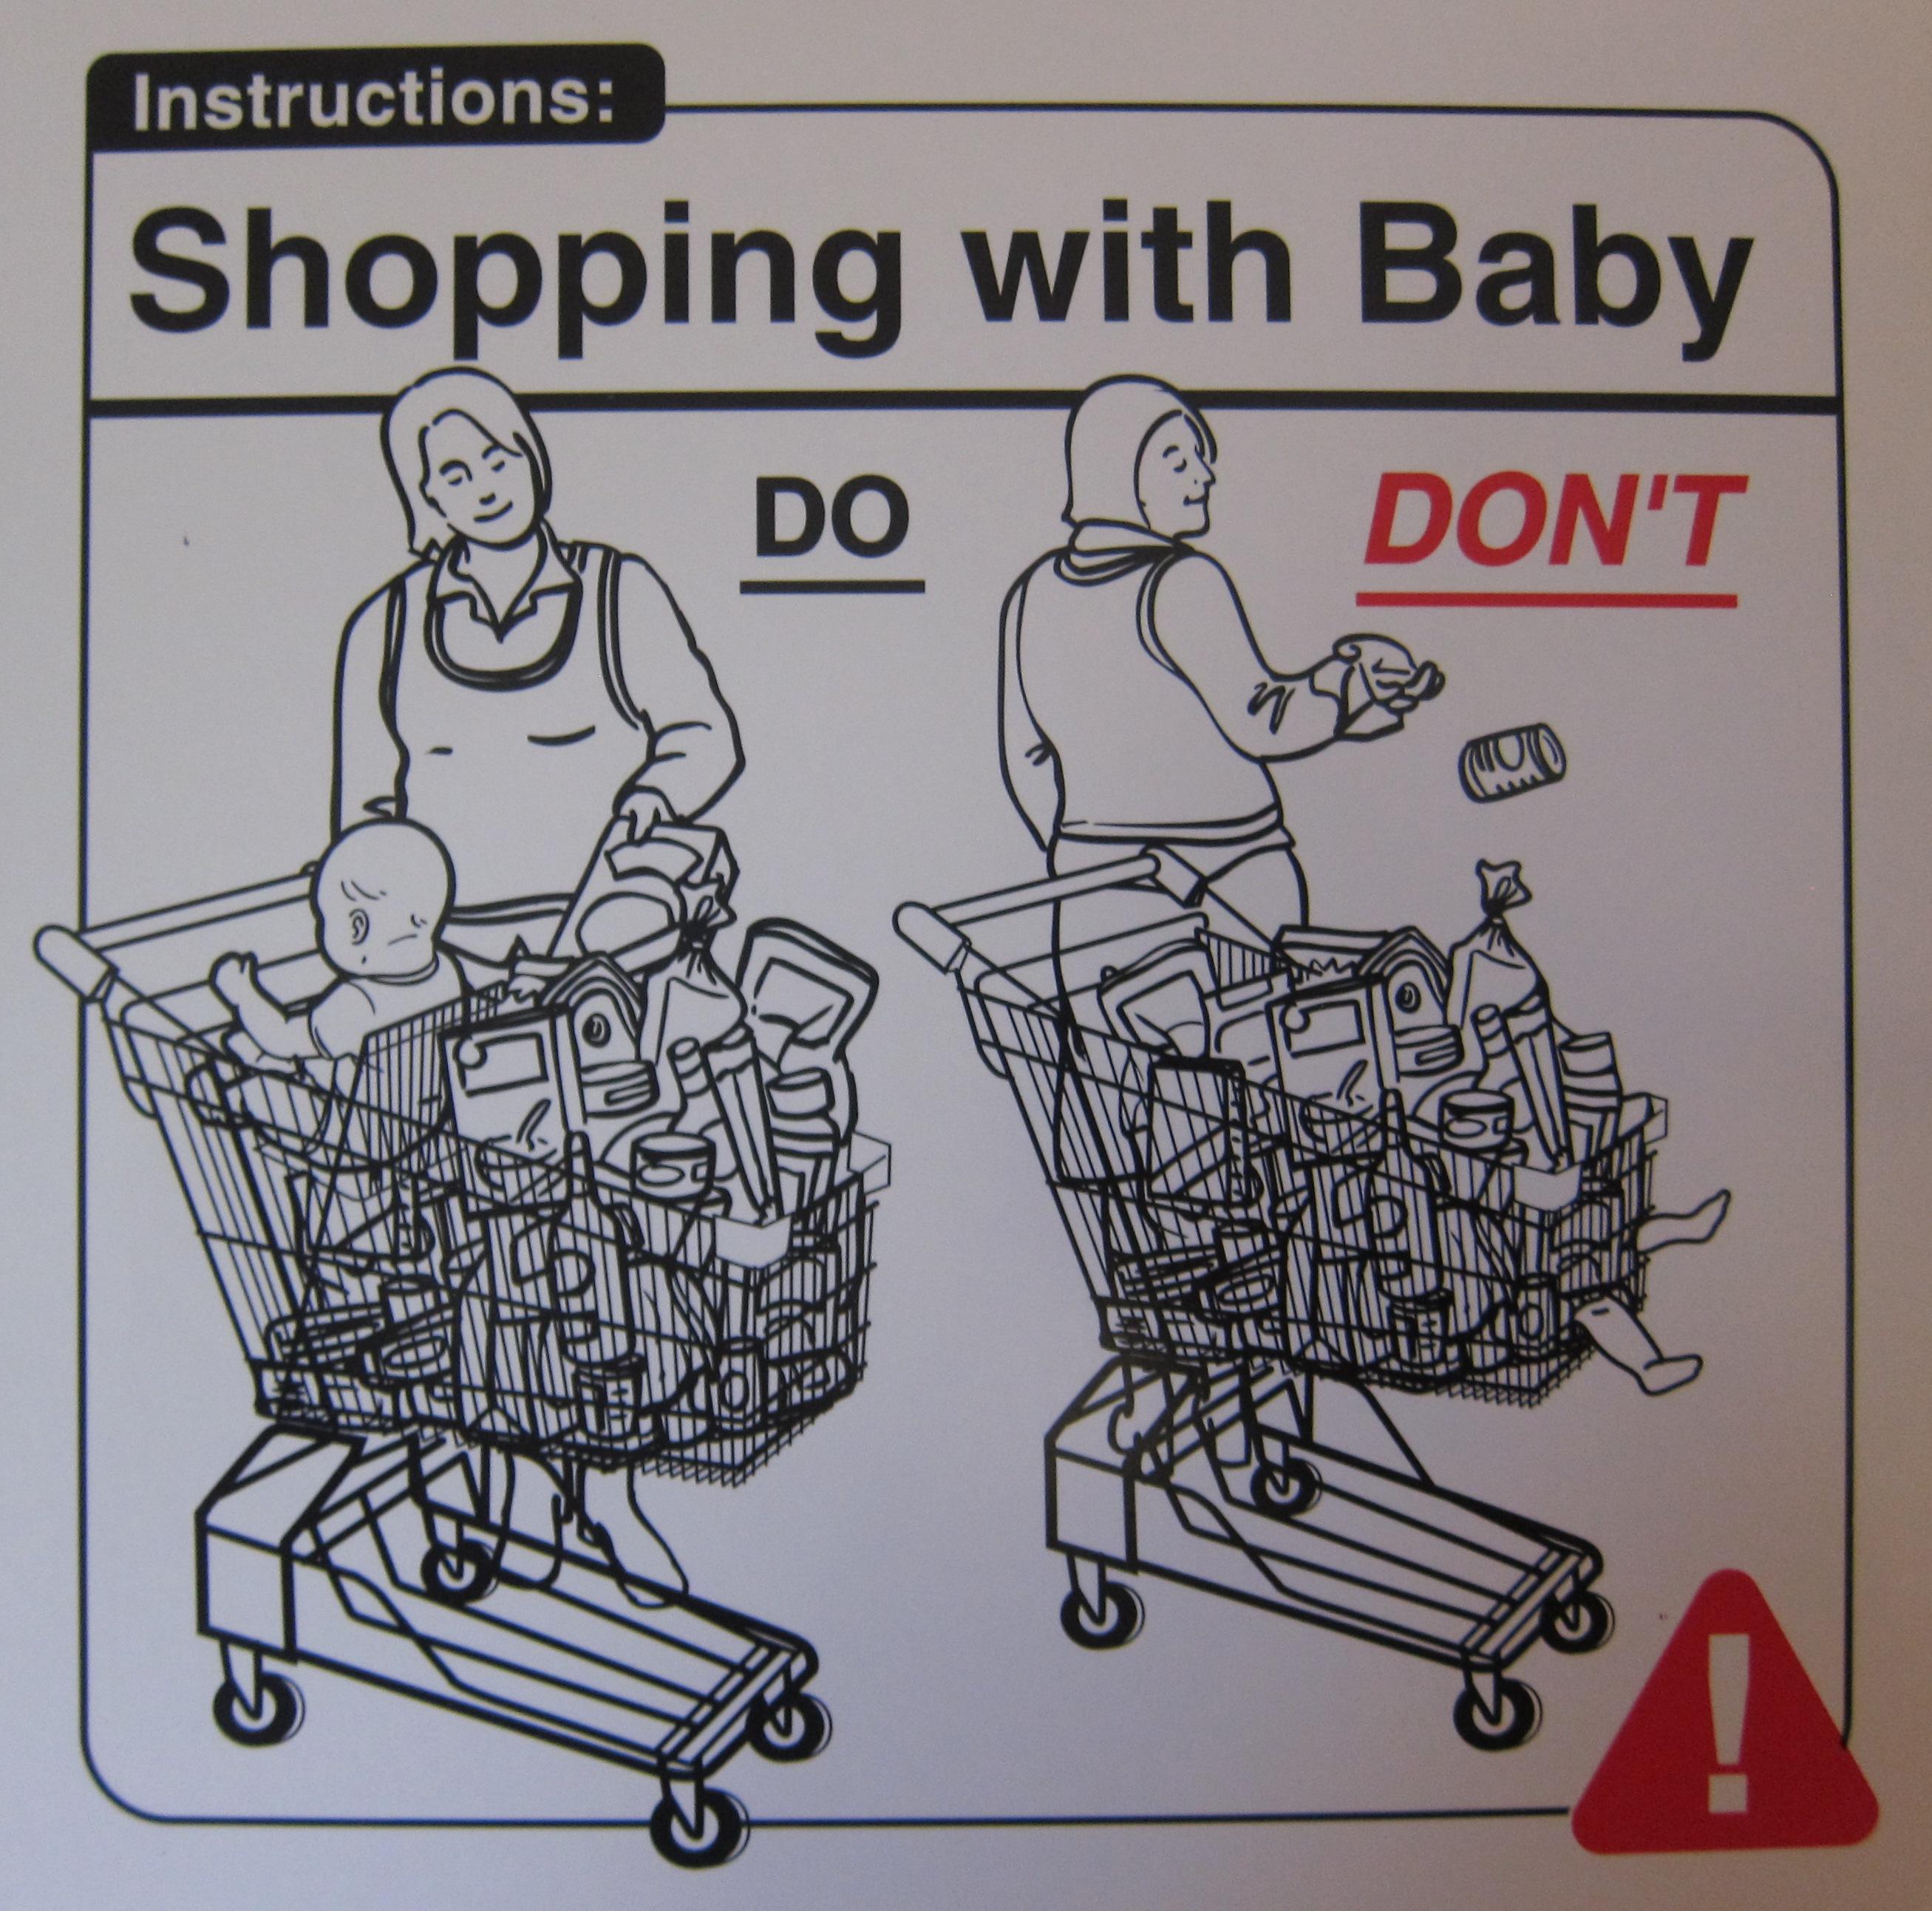 Parenting Tip of the Week 21 – Shop Safely